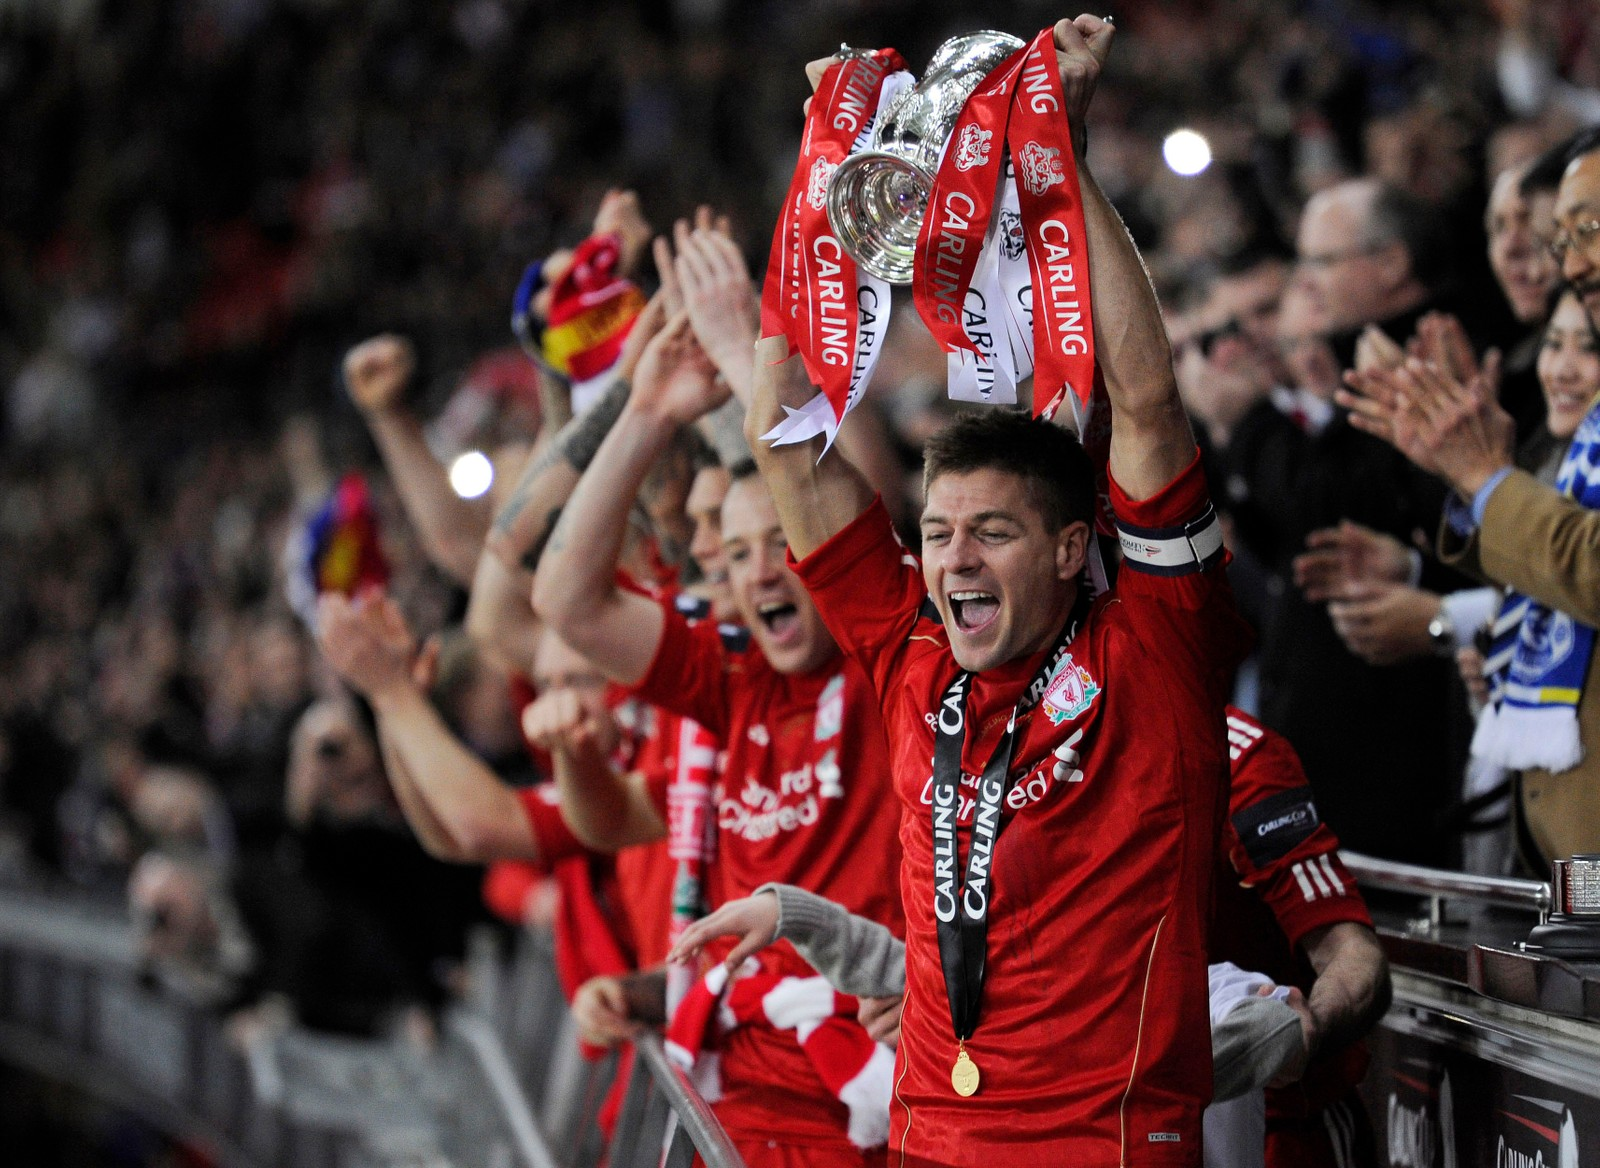 Dette ble det siste trofeet i Gerrard karriere i England. Liverpool vant ligacupen i 2012.